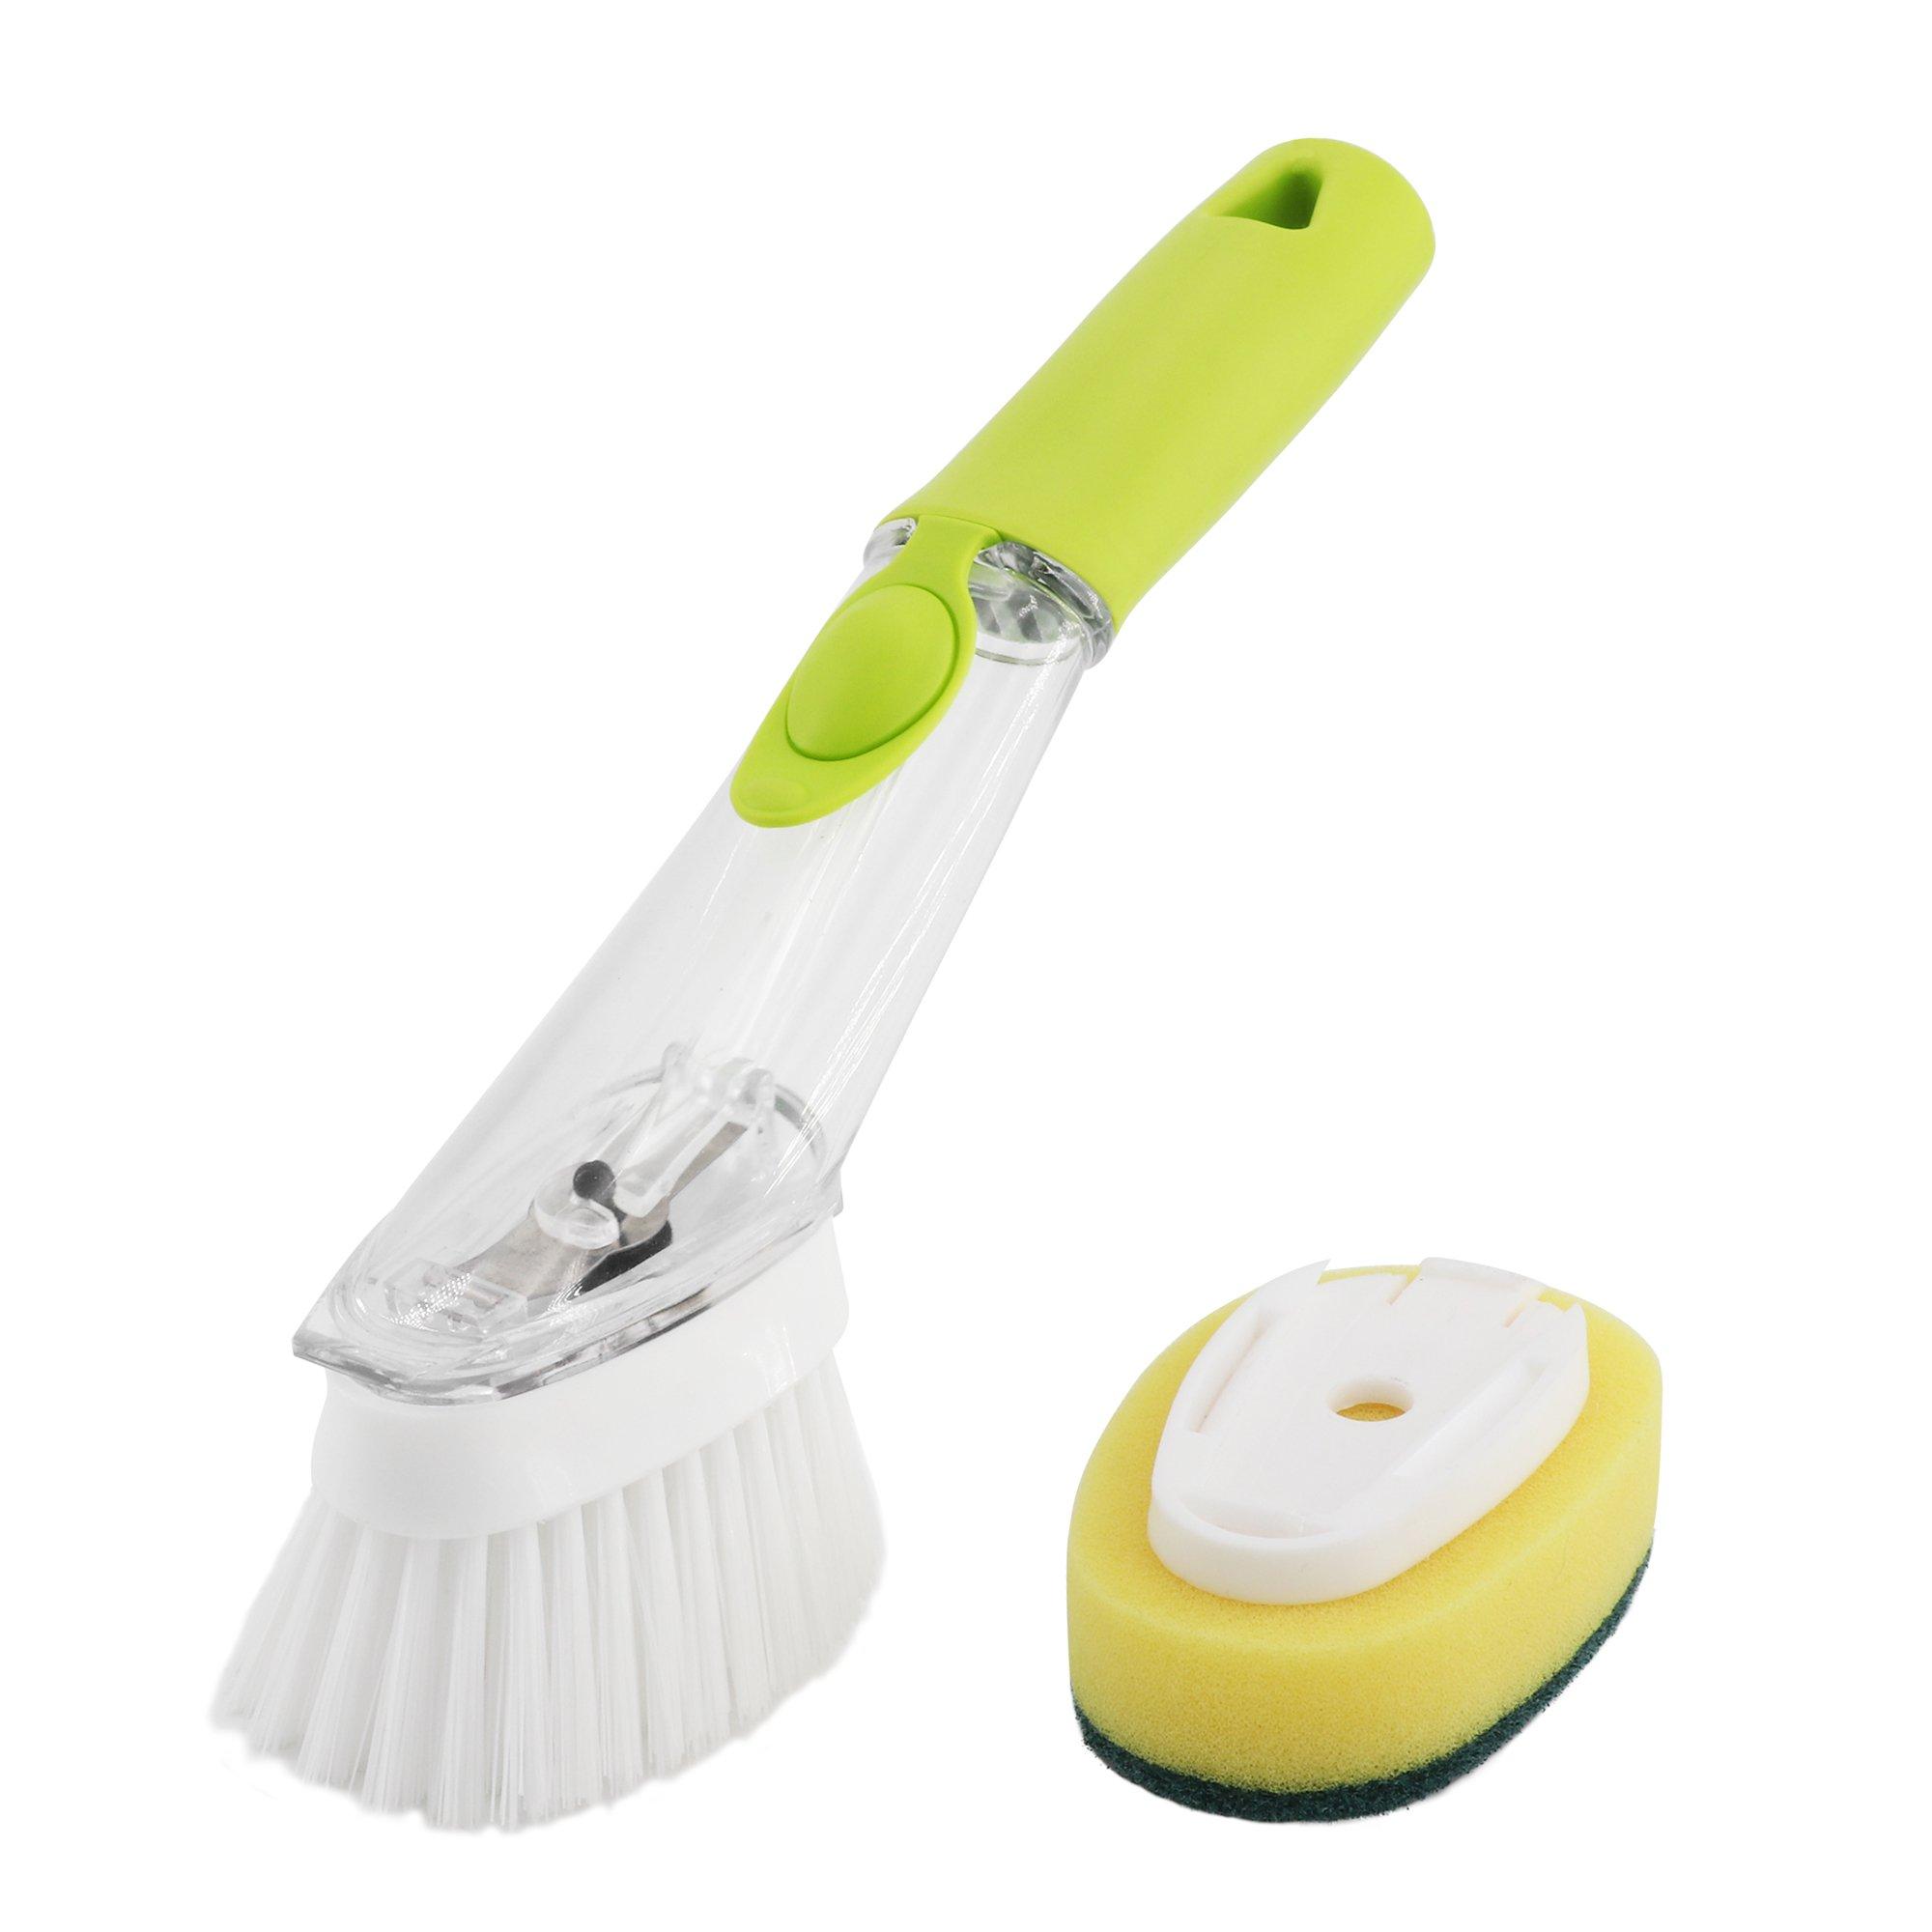 Deep Clean Dish Brush Set - Soap Dispensing Dish Brushes Refills 2 Pack ,Soap Dispensing Sponge Brush Scrub Brush ,Kitchen Grill Home Dish Brush Scrubbers With Refill Liquid Soap Dispenser DACHMA